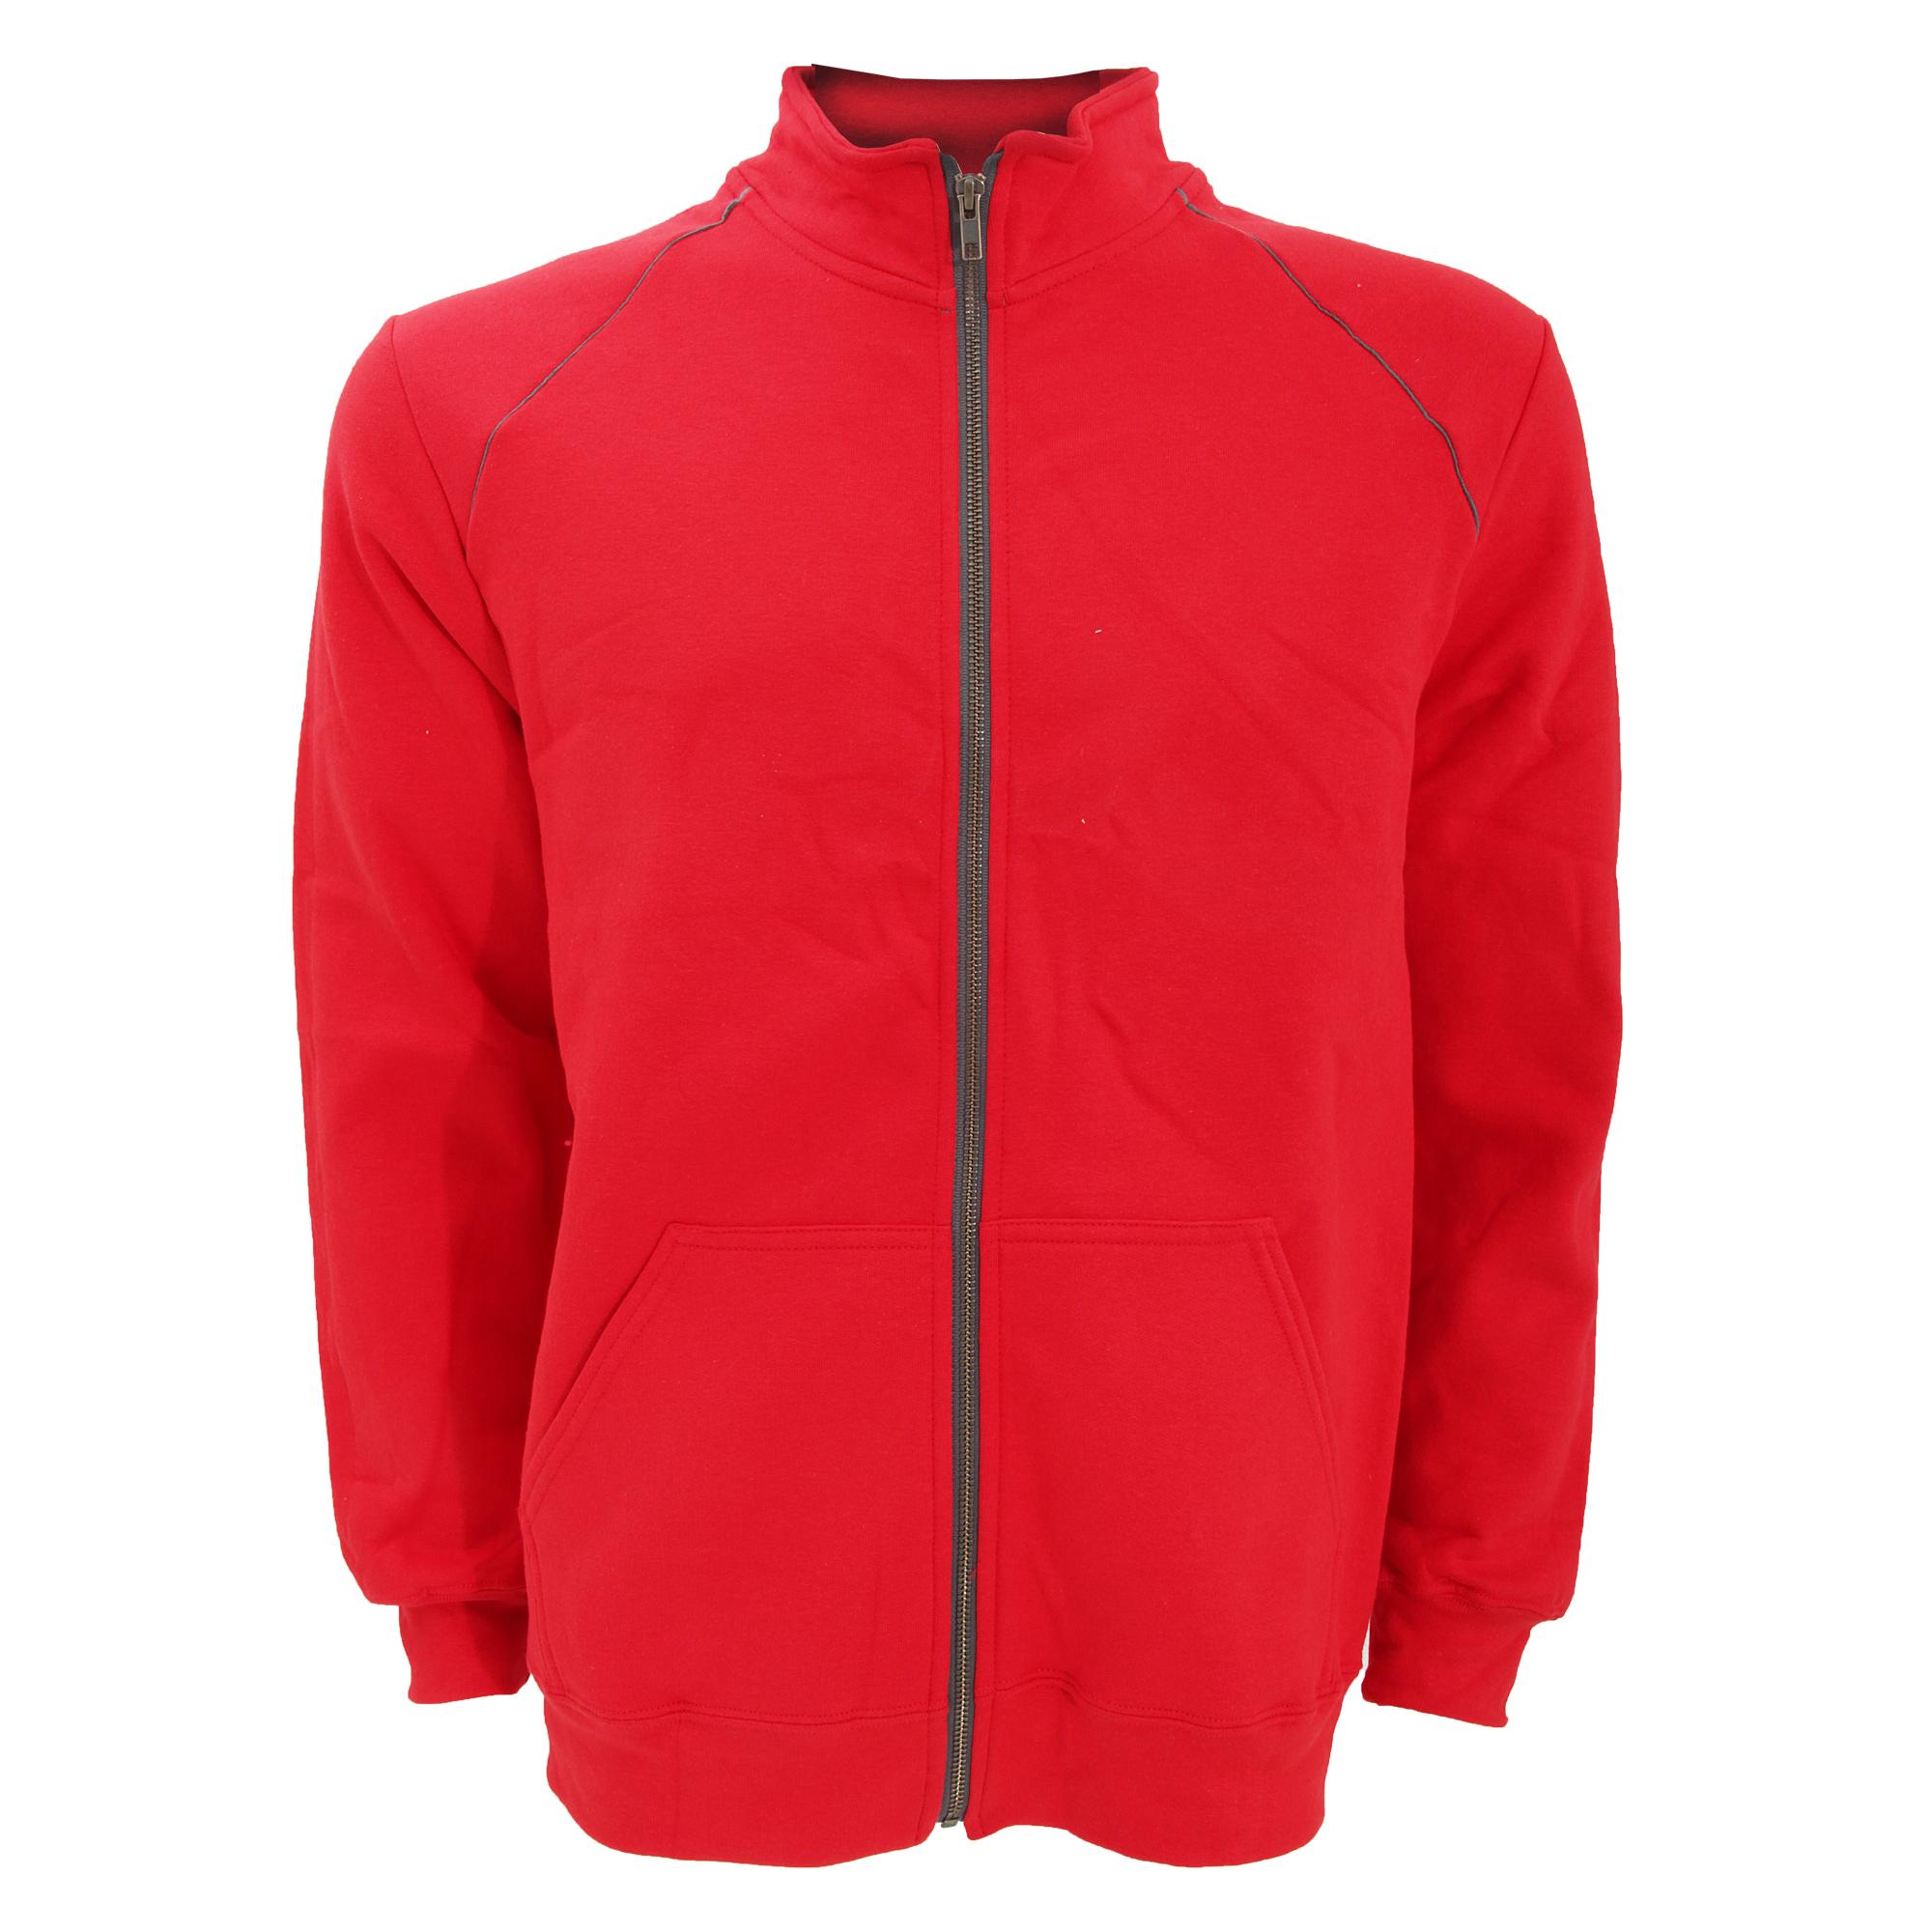 Gildan-Mens-Premium-Cotton-Ringspun-Fleece-Full-Zip-Jacket-L-S-M-2XL-RW3172 thumbnail 4